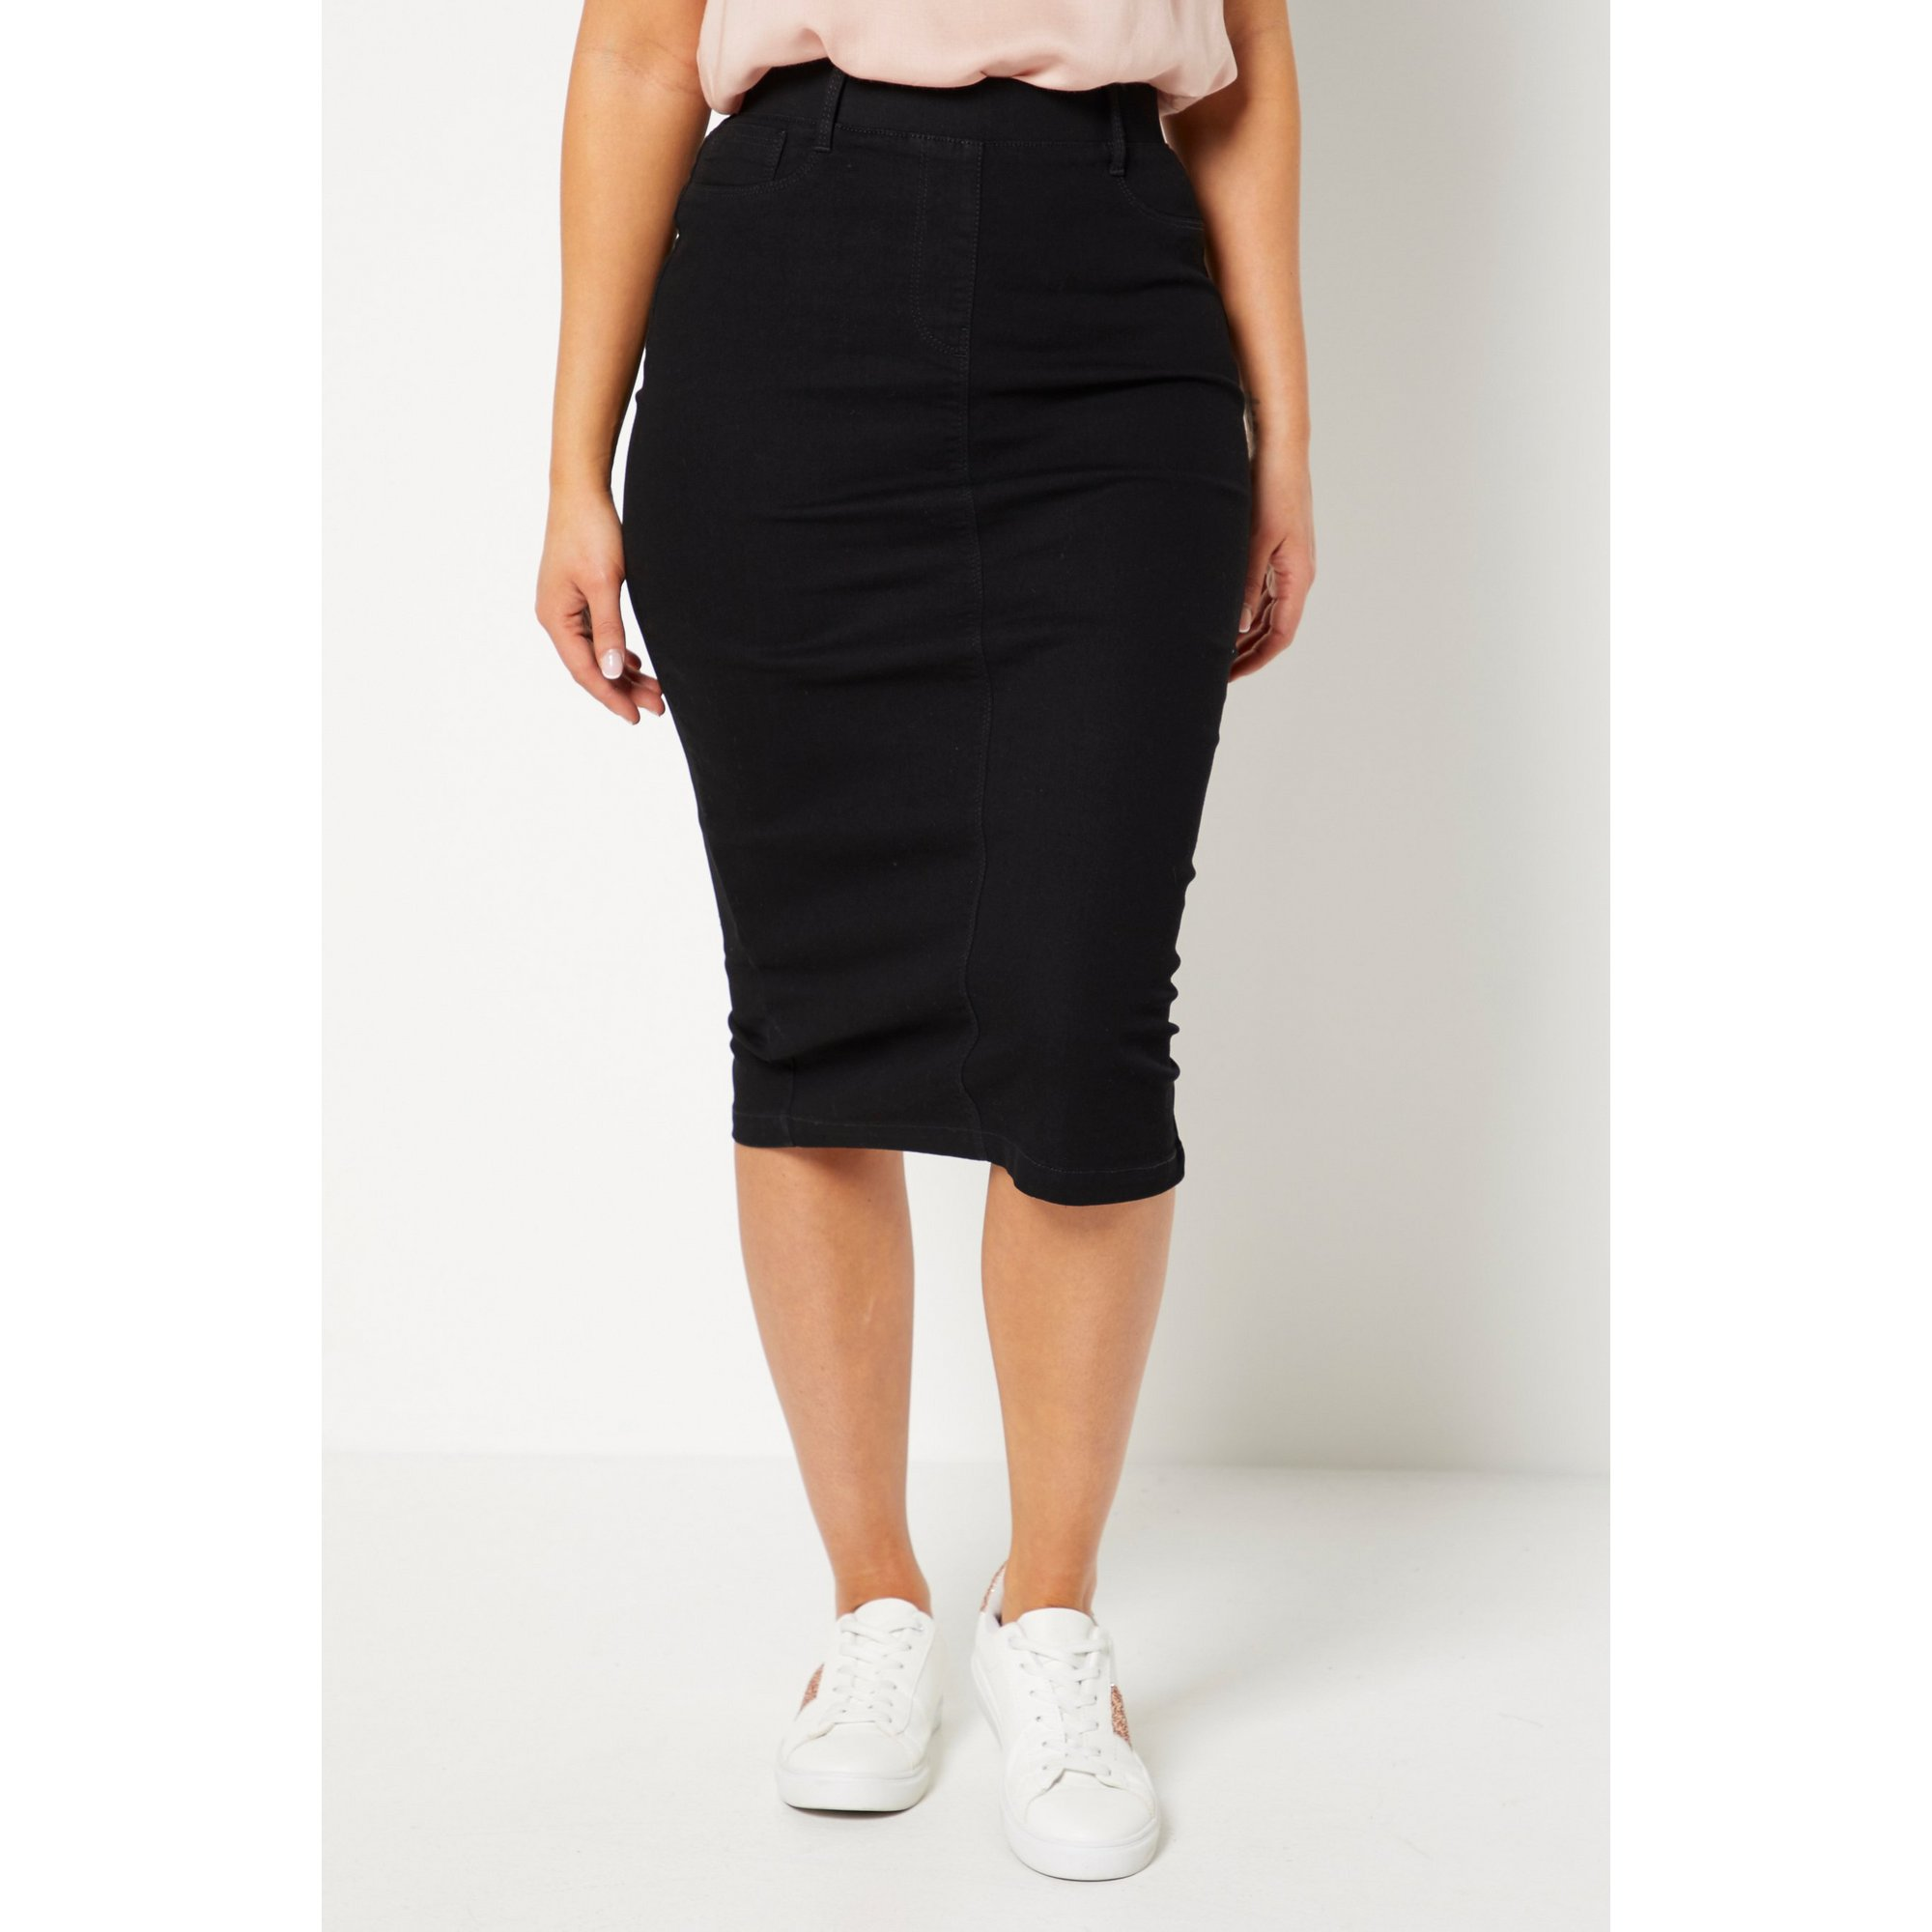 Image of Black Jegging Skirt